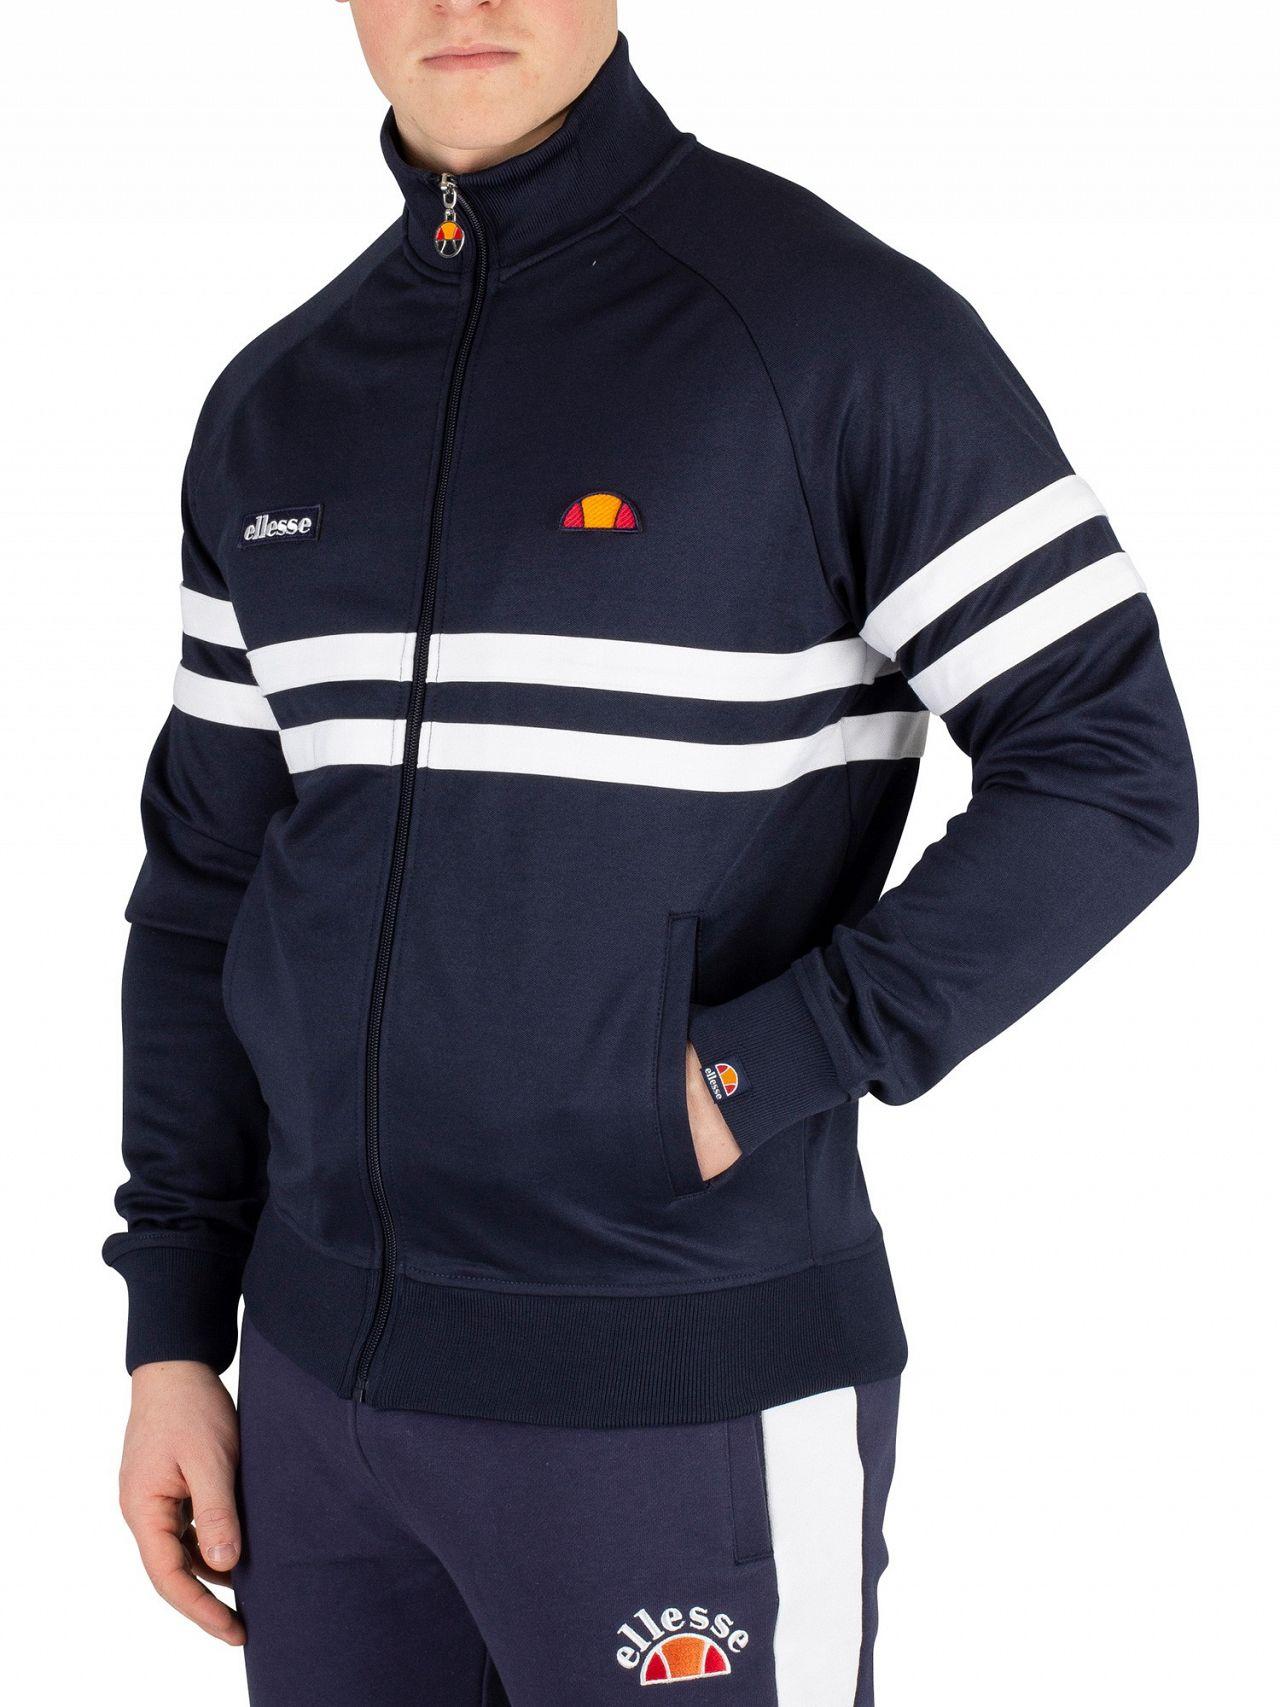 6e537aa5 Ellesse Navy Rimini Track Jacket